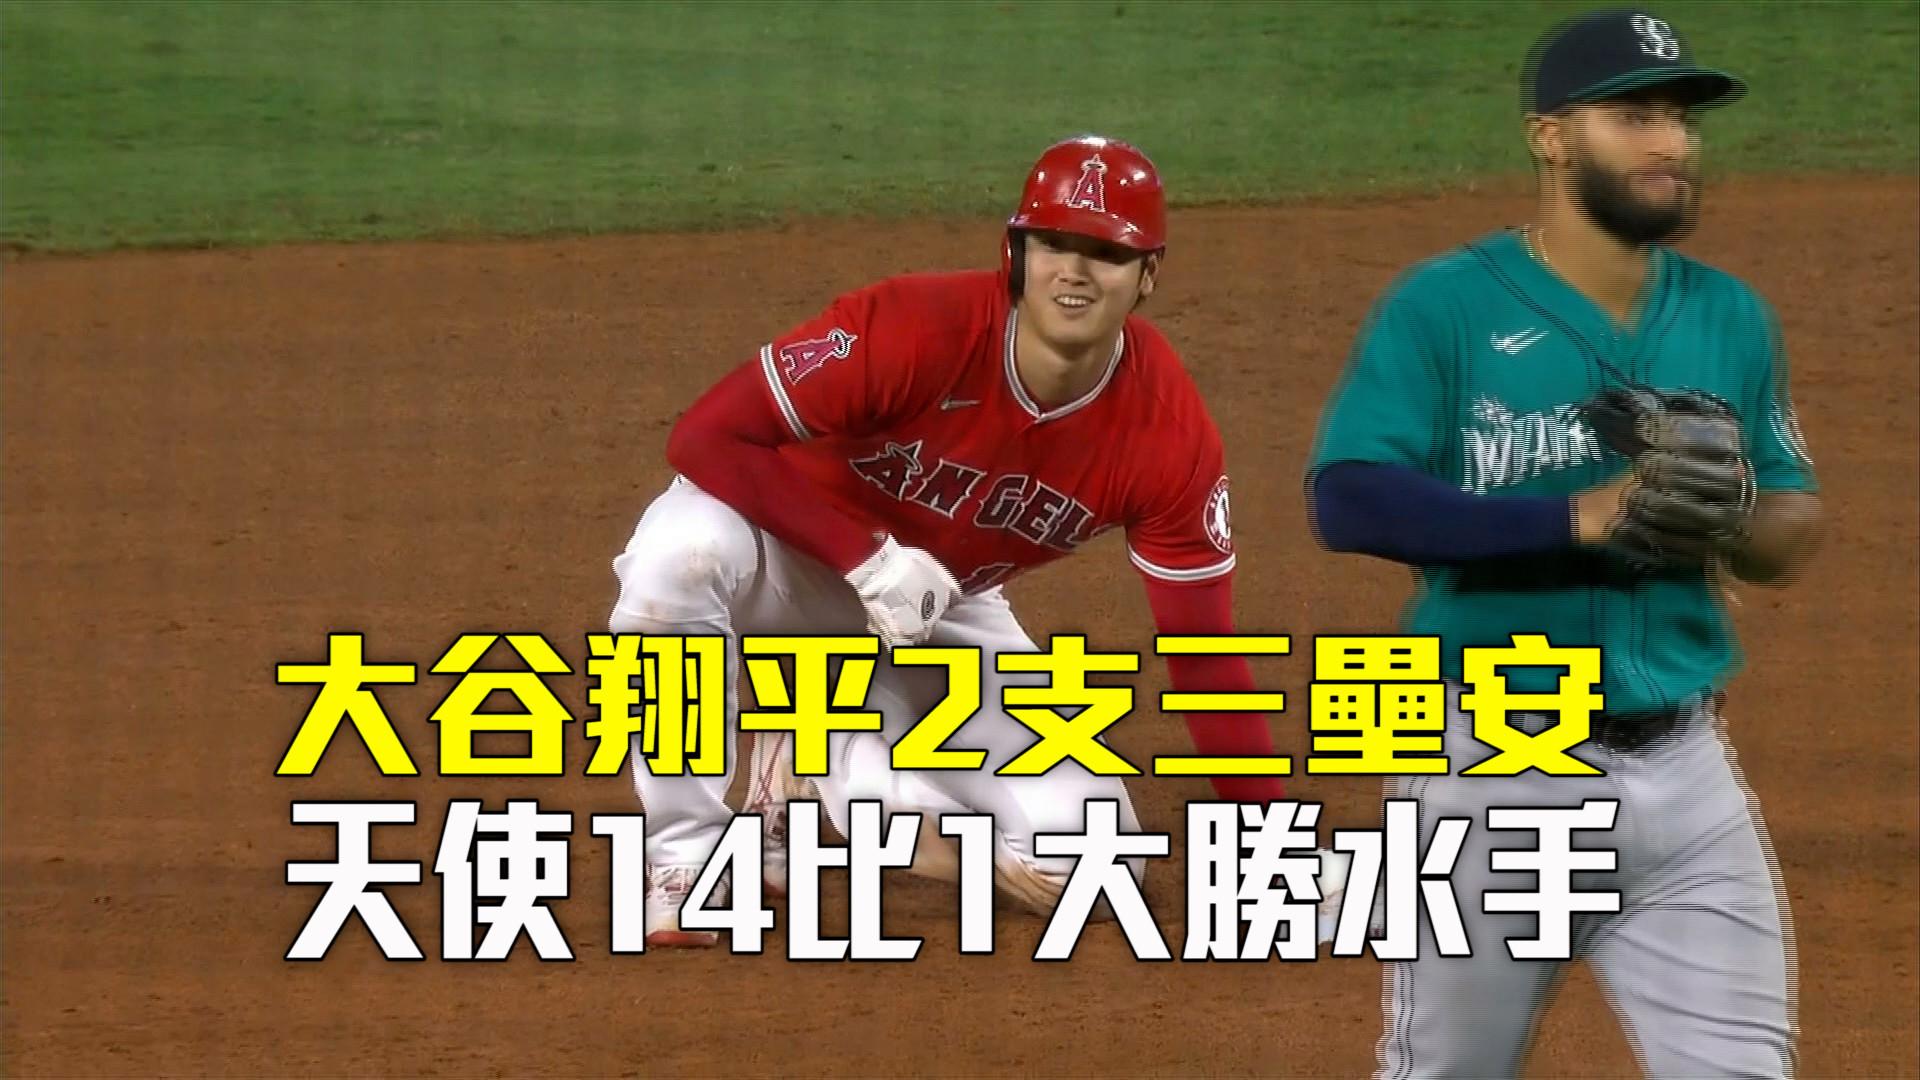 【MLB看愛爾達】大谷翔平2支三壘安 天使14:1大勝水手 9/26